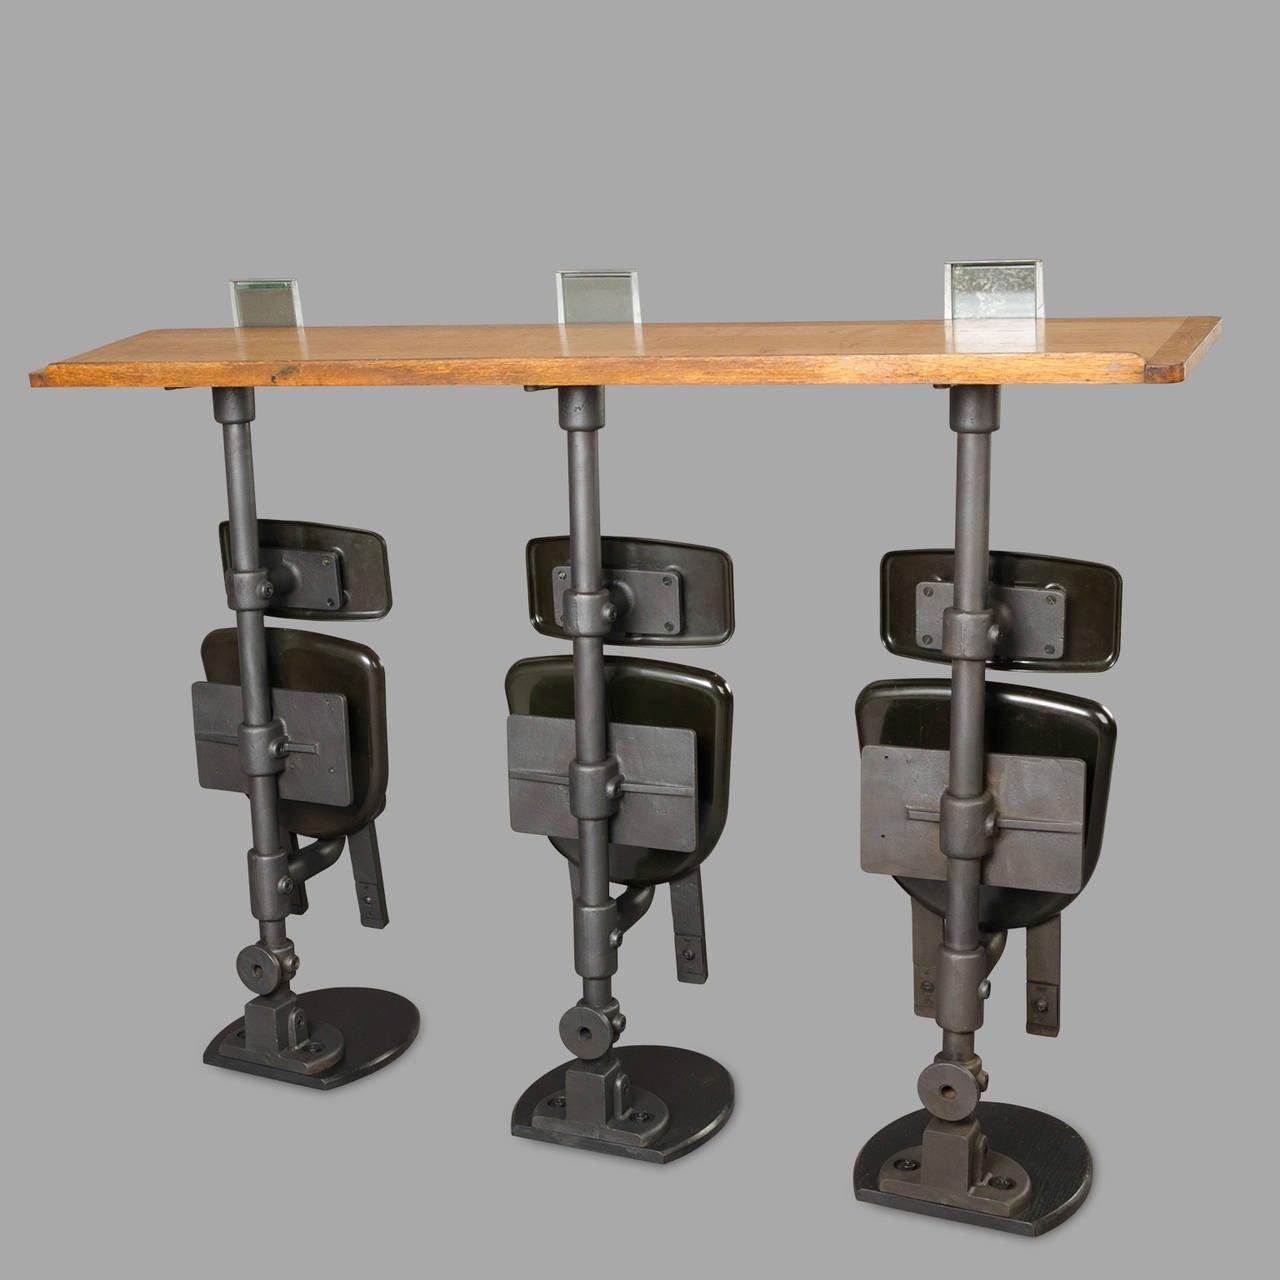 Three Amphitheater Folding Seats With Oak Writing Desks